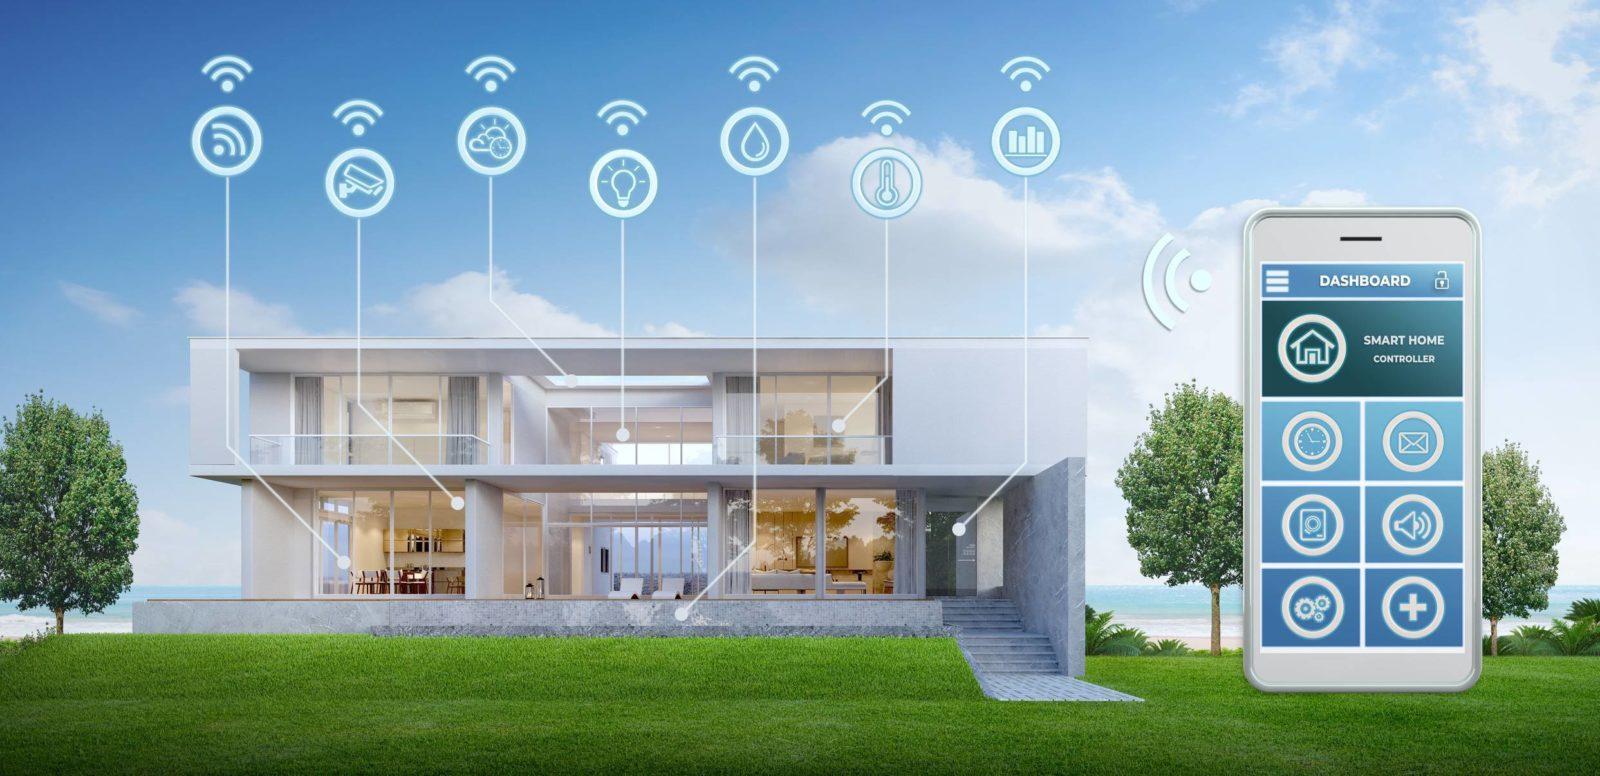 bâtiment intelligent